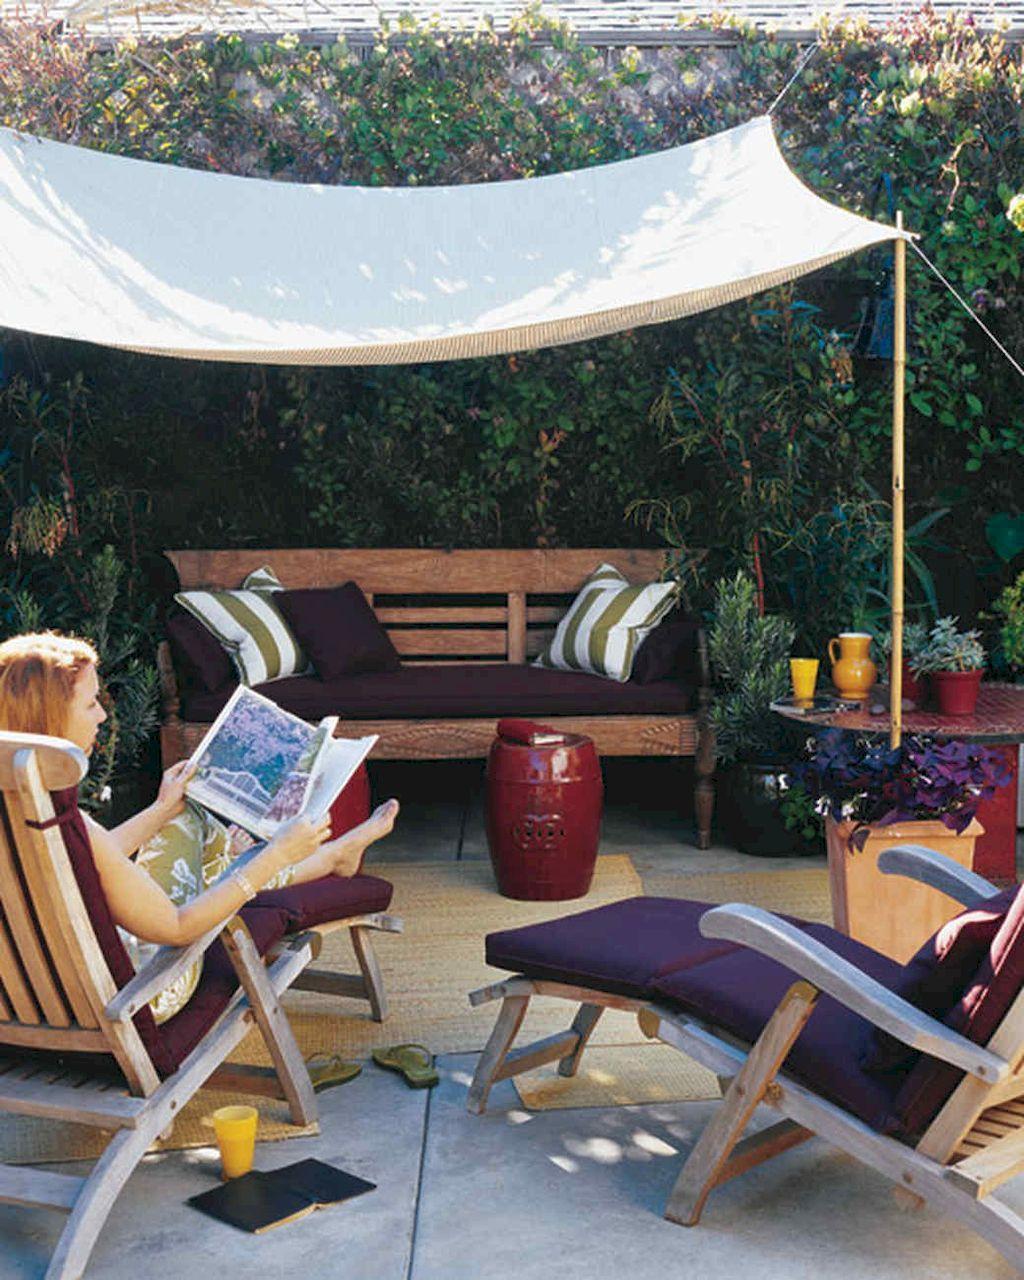 Adorable 50 fresh concept outdoor canopy for home patio